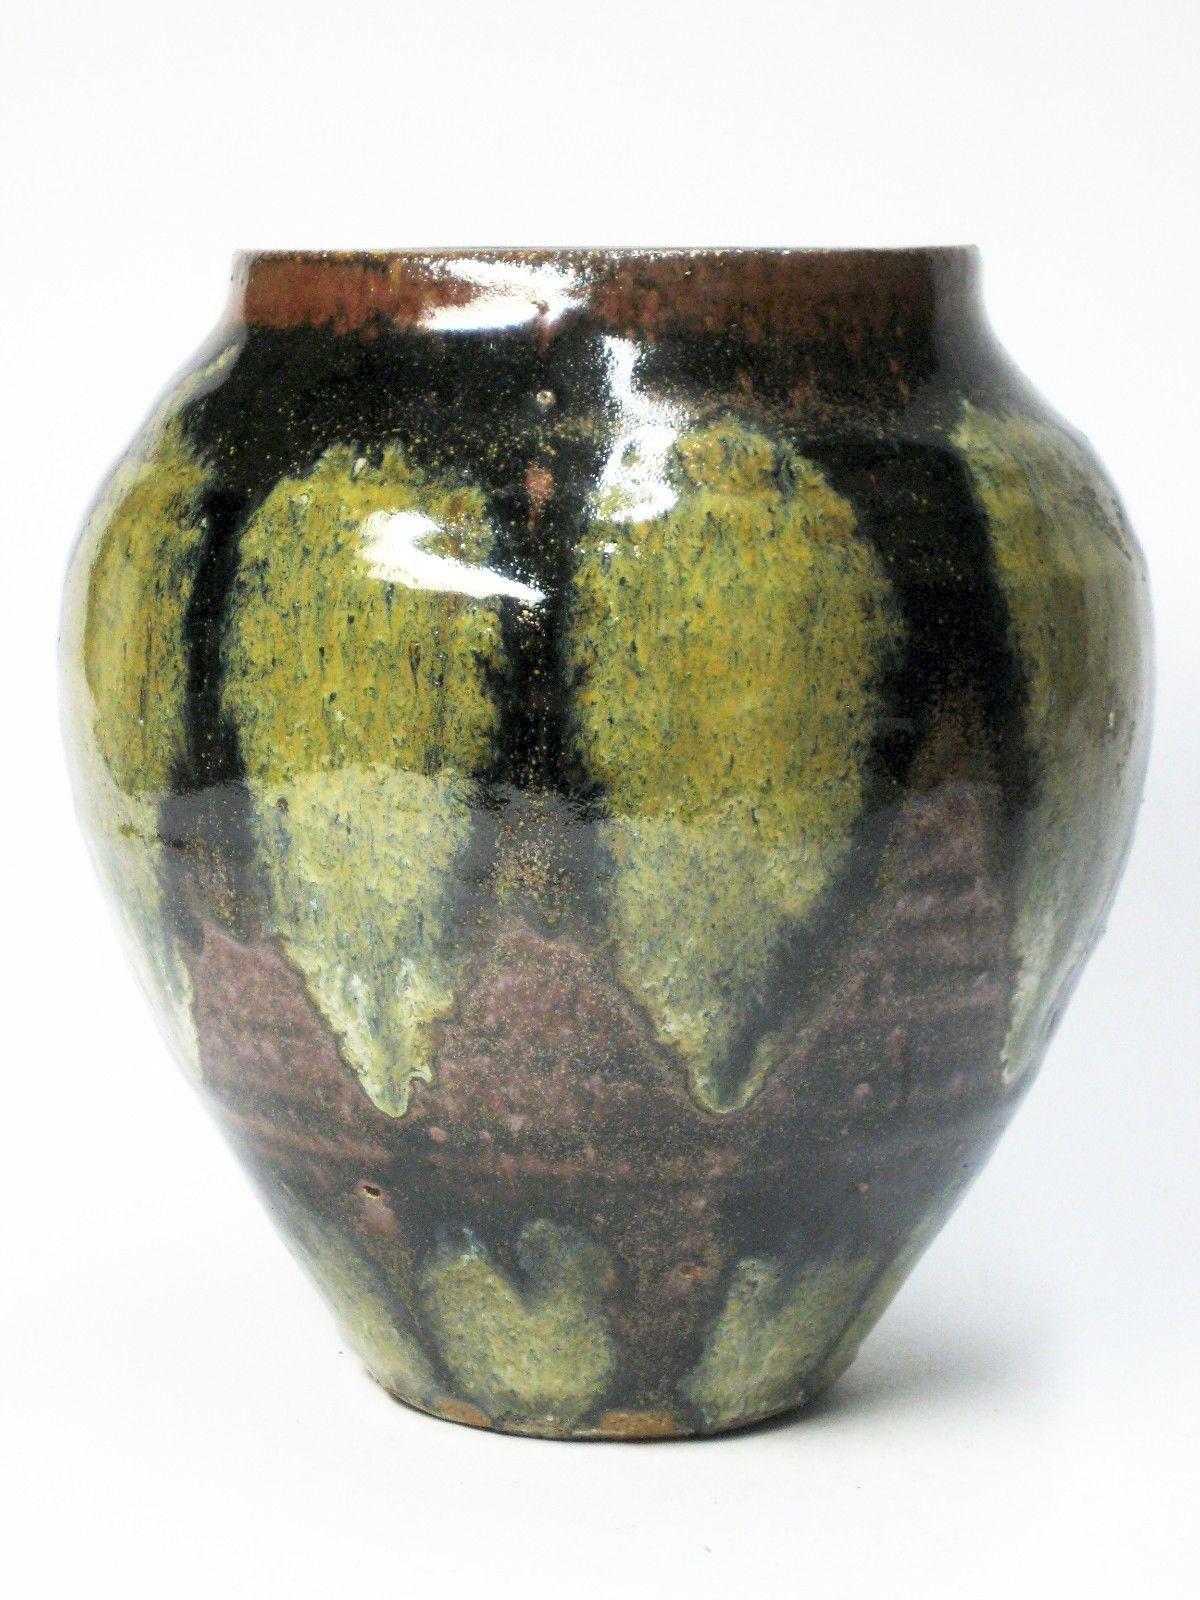 modern pottery vases of studio art stoneware pottery danish modern mid century tenmoku vase with regard to studio art stoneware pottery danish modern mid century tenmoku vase pot vessel